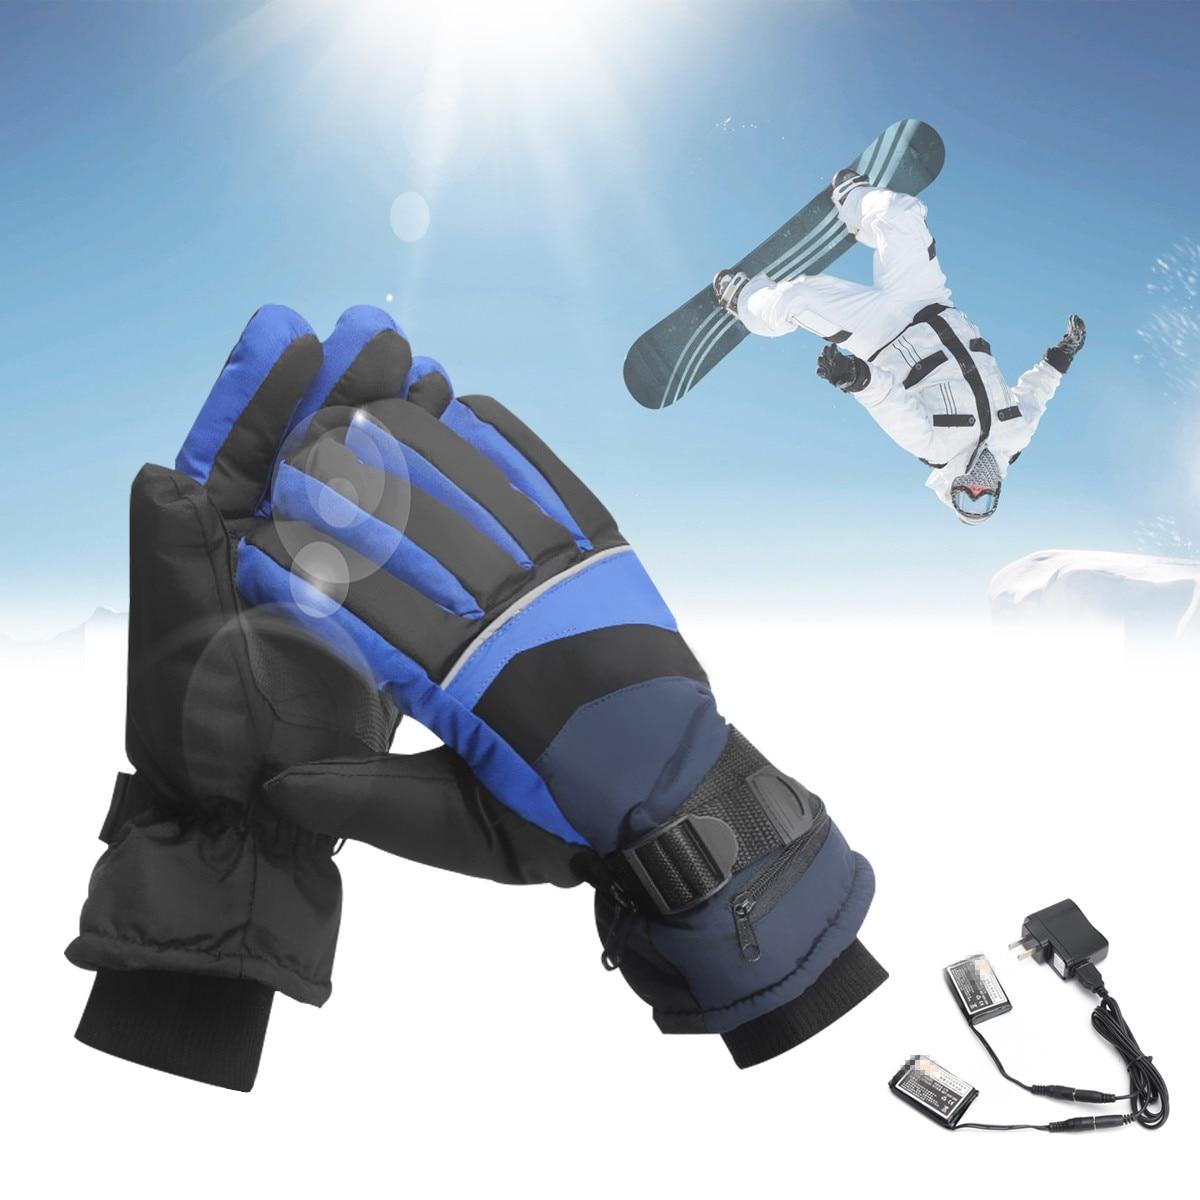 Mofaner Waterproof Motorcycle Electric <font><b>Heated</b></font> <font><b>Gloves</b></font> Outdoor Snowboarding Work Winter <font><b>Gloves</b></font> Hands Warmer Rechargeable <font><b>Battery</b></font> L